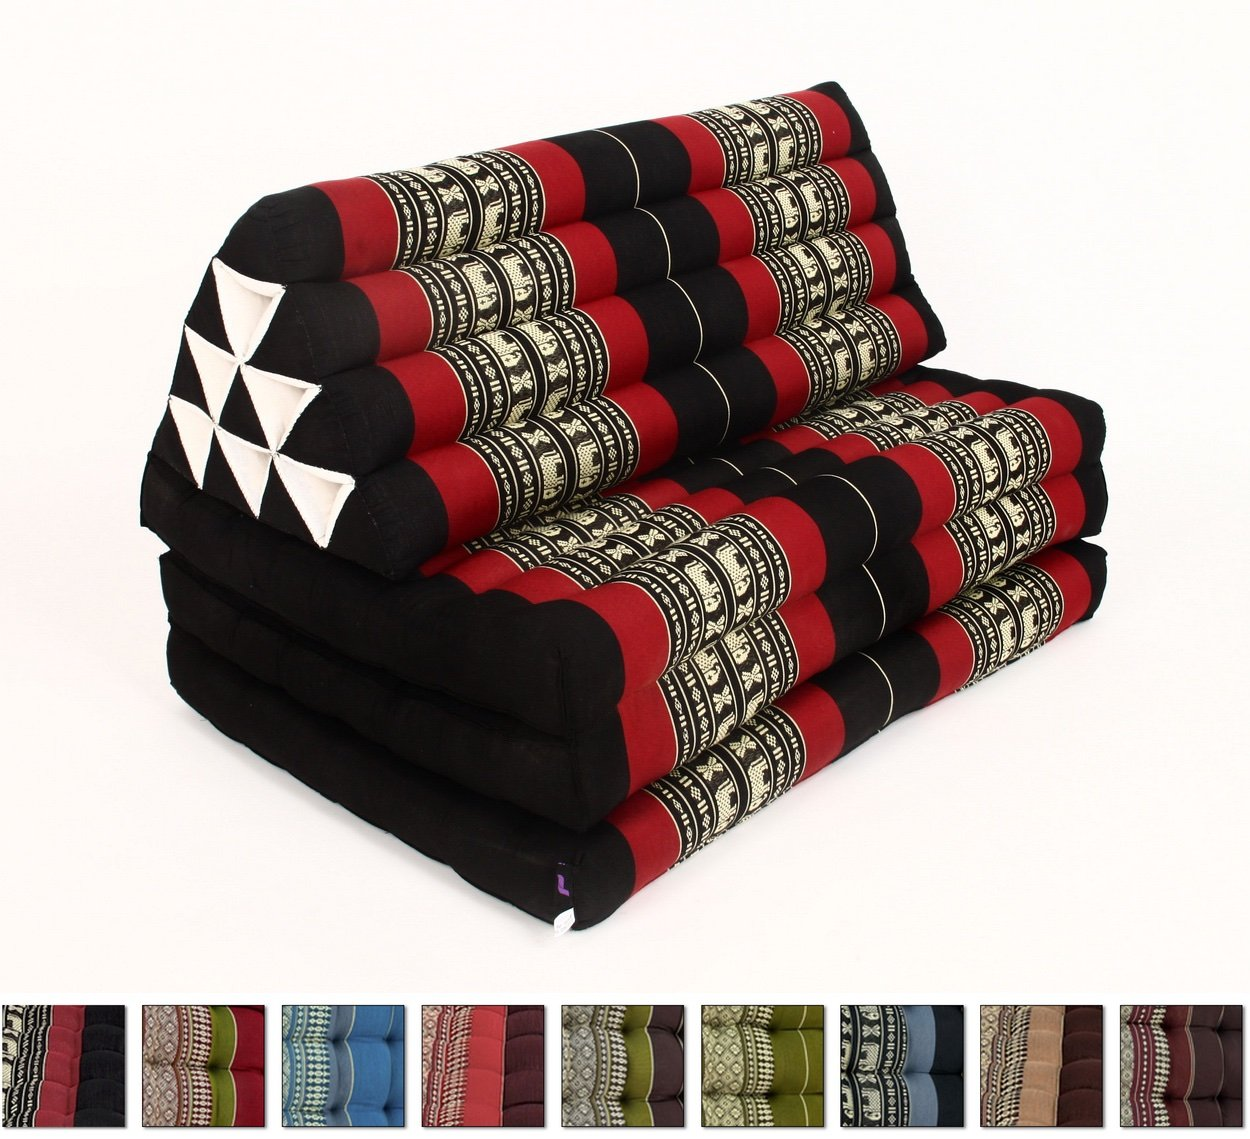 Leewadee XL Foldout Triangle Thai Cushion, 79x30x3 inches, Kapok Fabric, Black Red, Premium Double Stitched